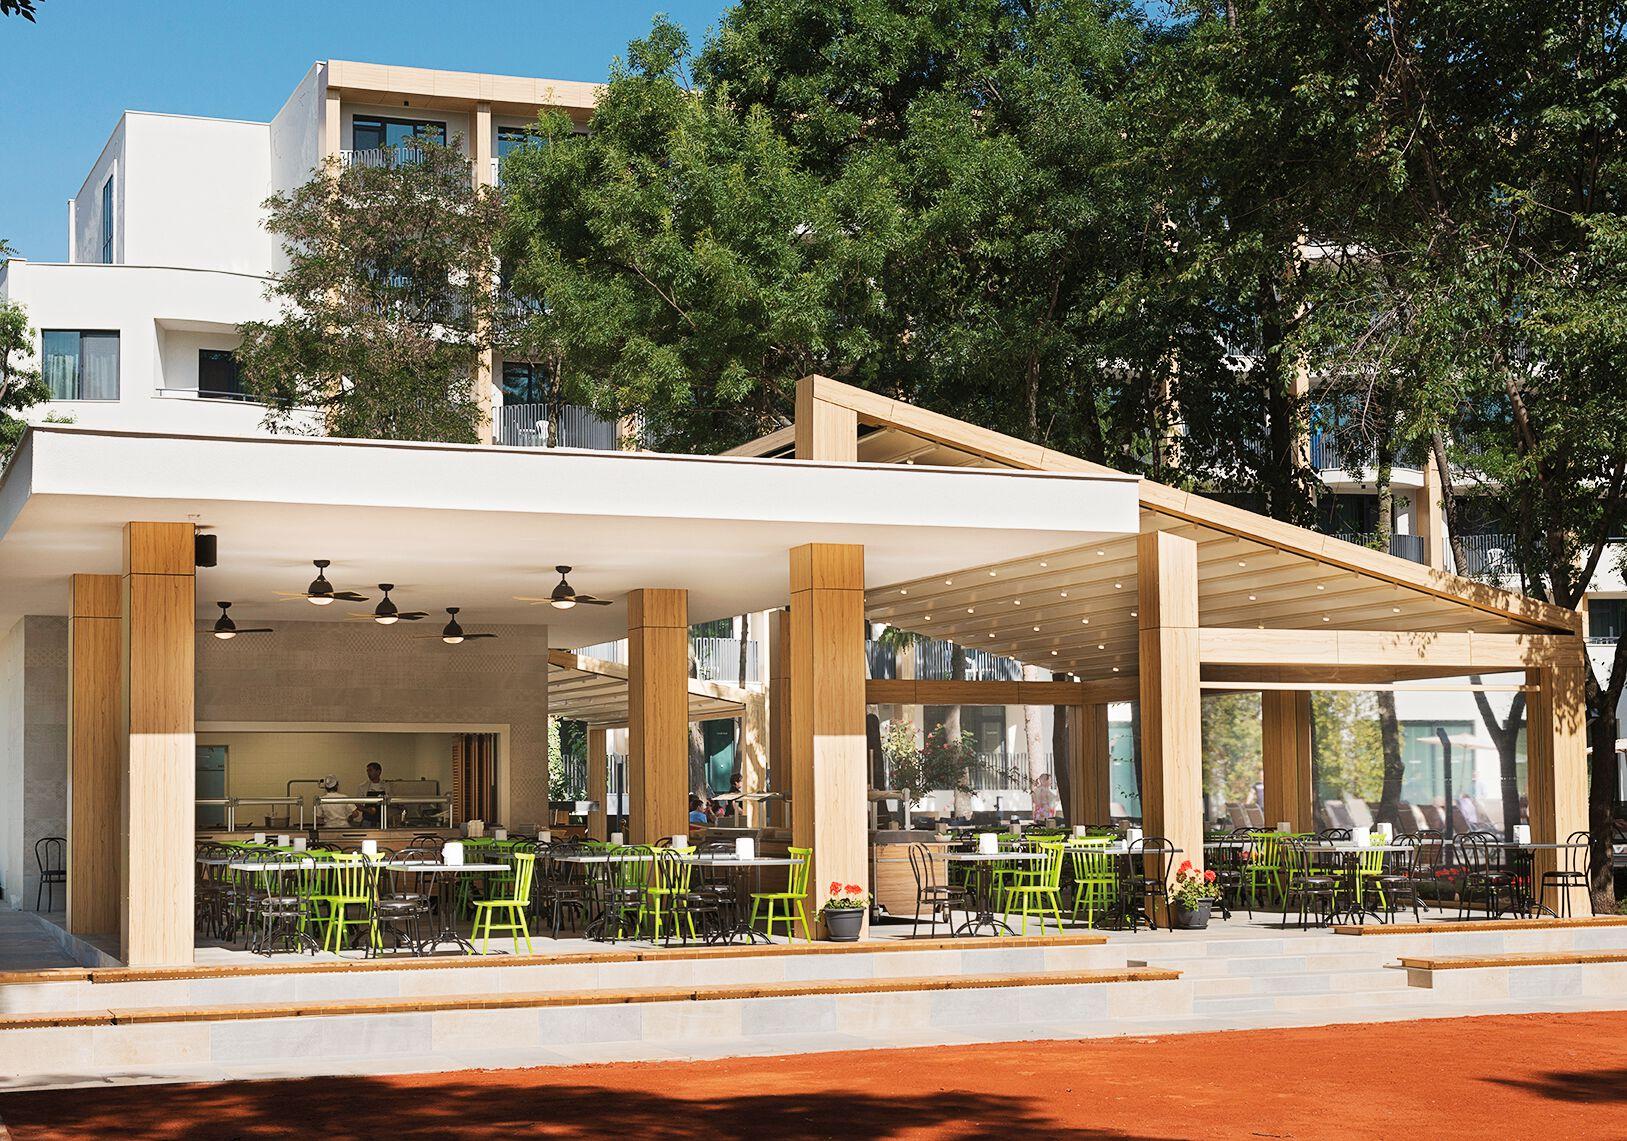 Bulgarie - Côte du Soleil - Sunny Beach - Hôtel HVD Club Bor 4*